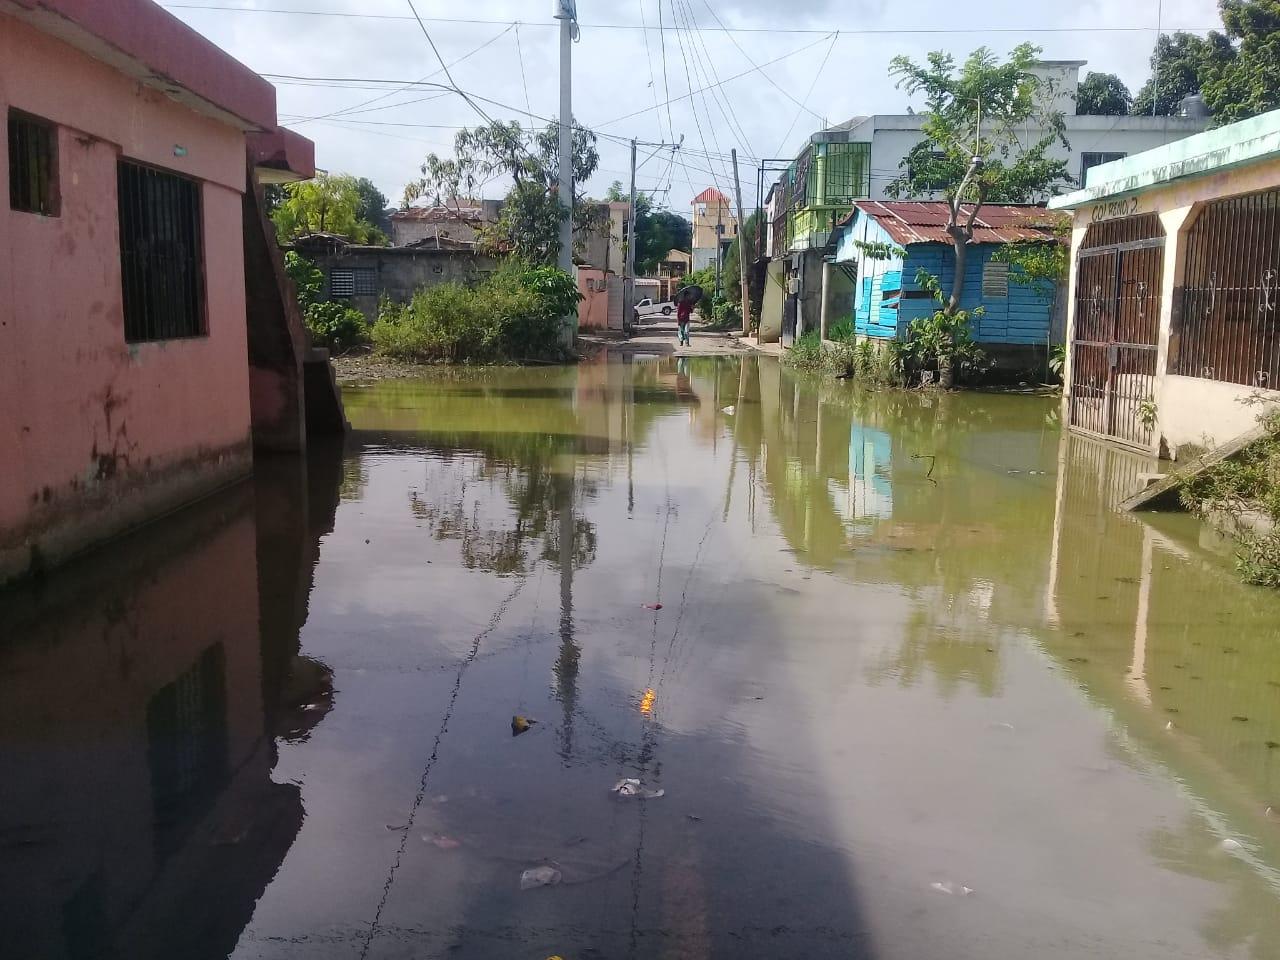 Viviendas continúan inundadas por paso de la onda tropical Beryl